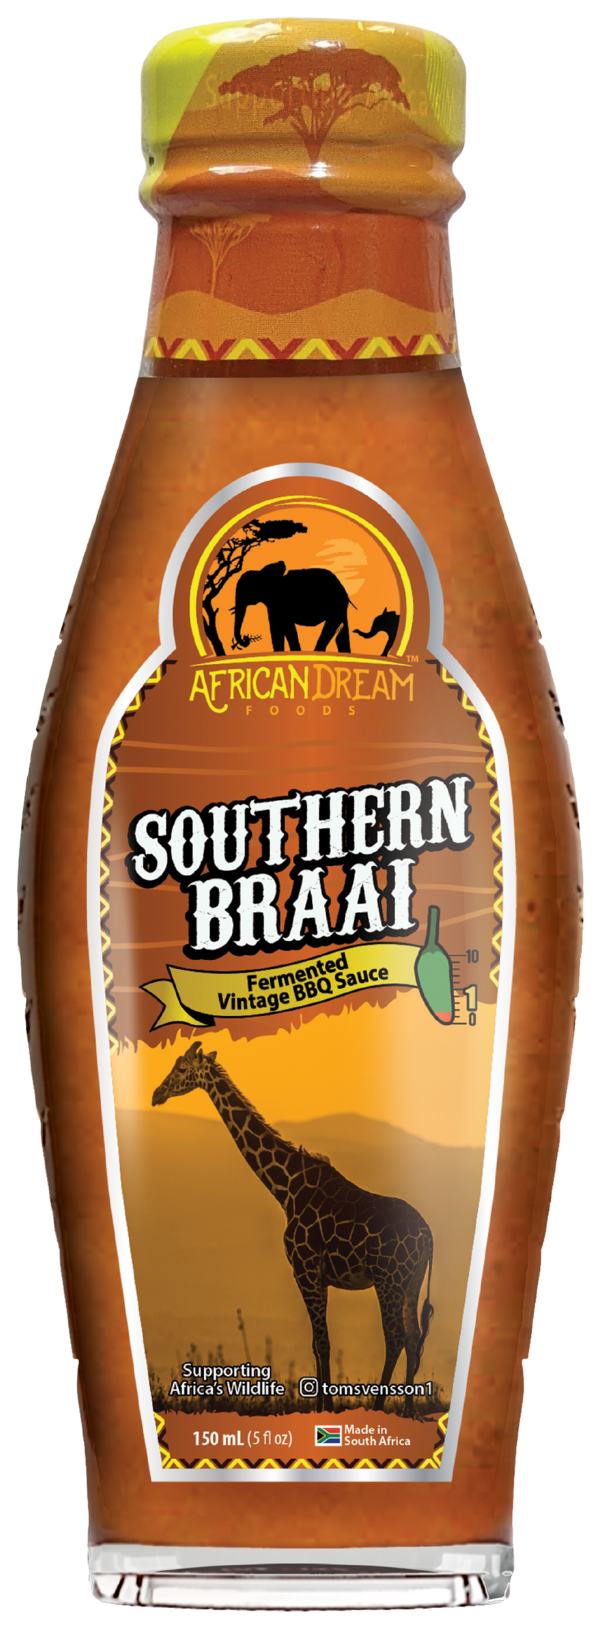 Southern Braai BBQ Sauce